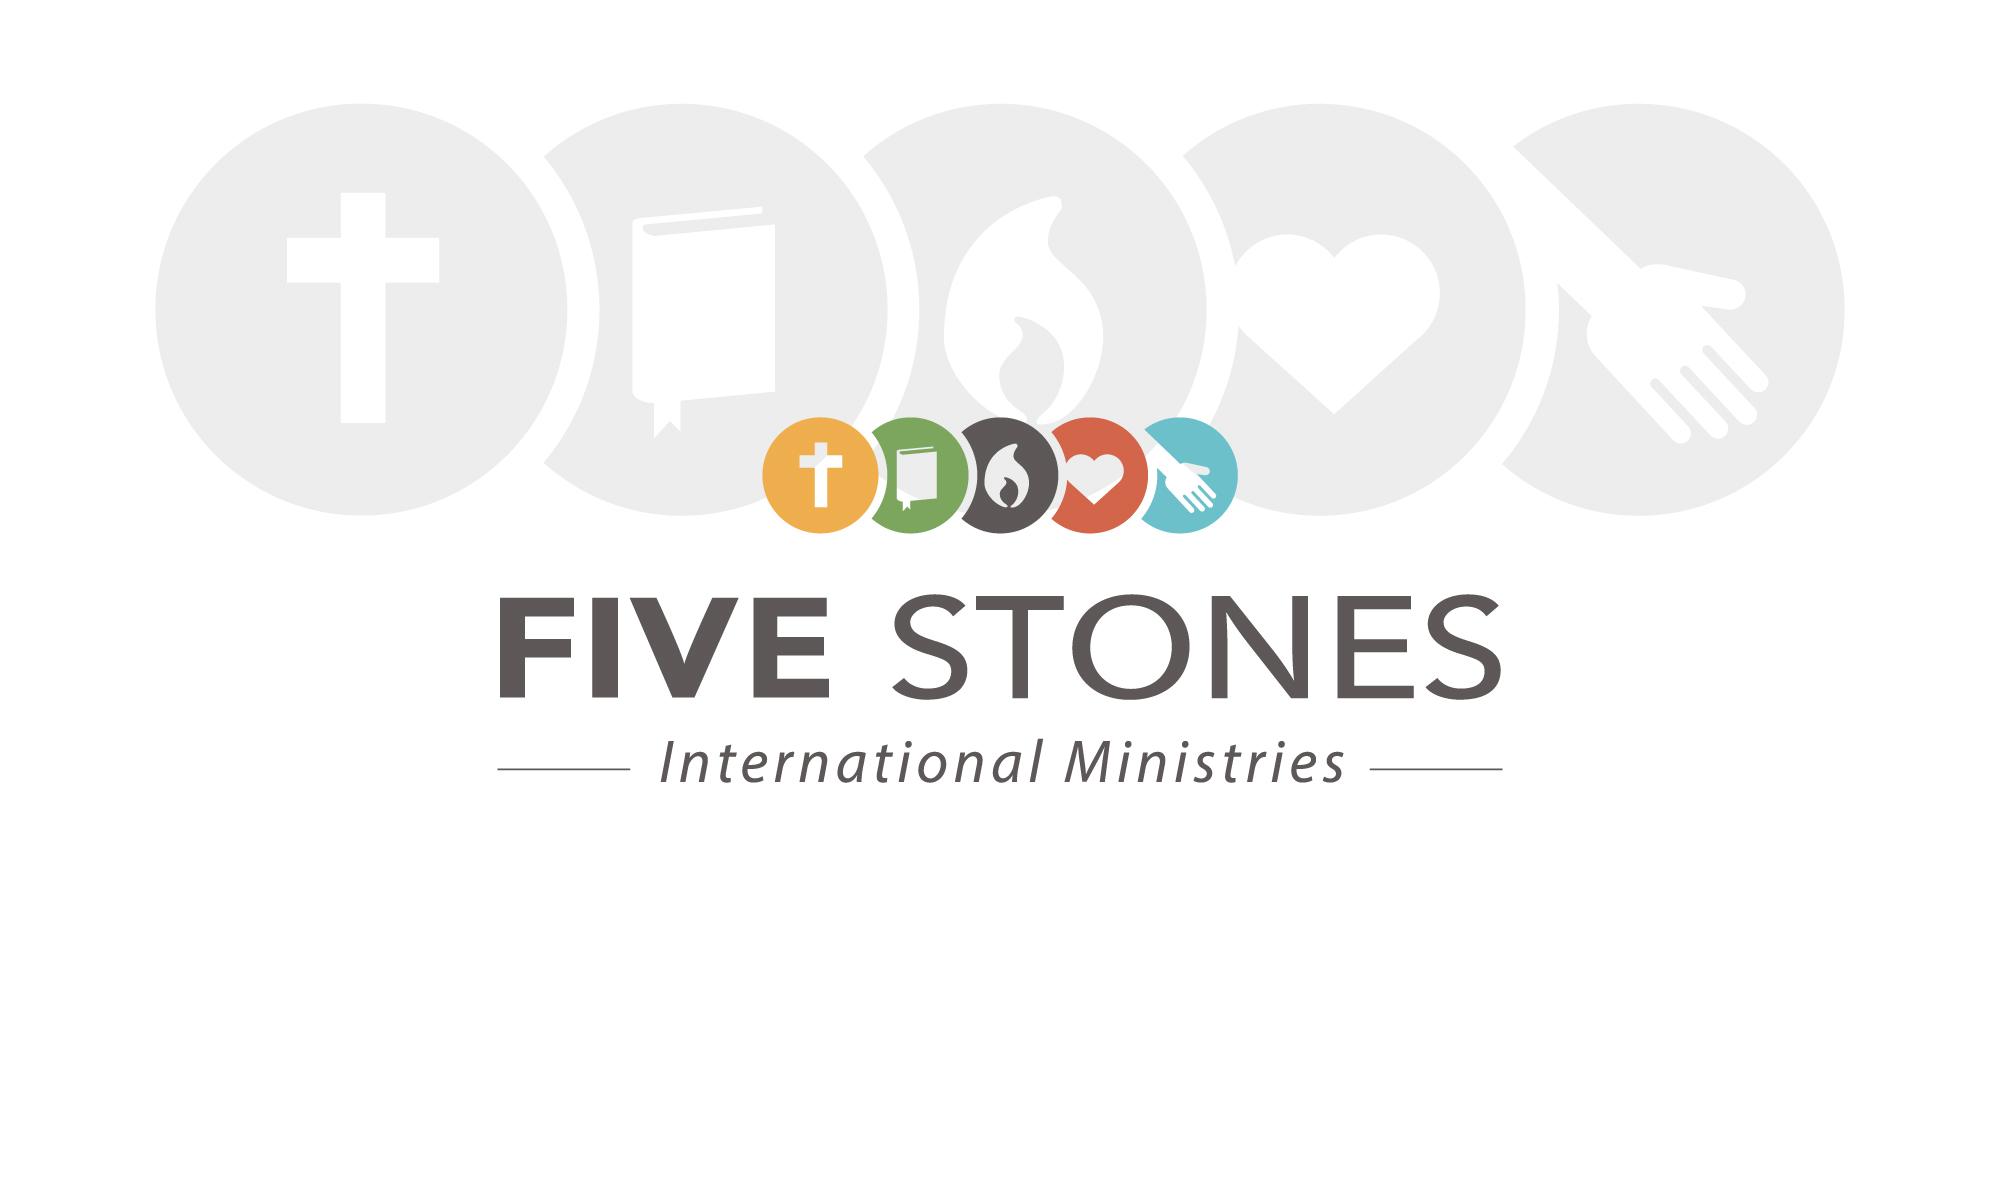 Five Stones International Ministries